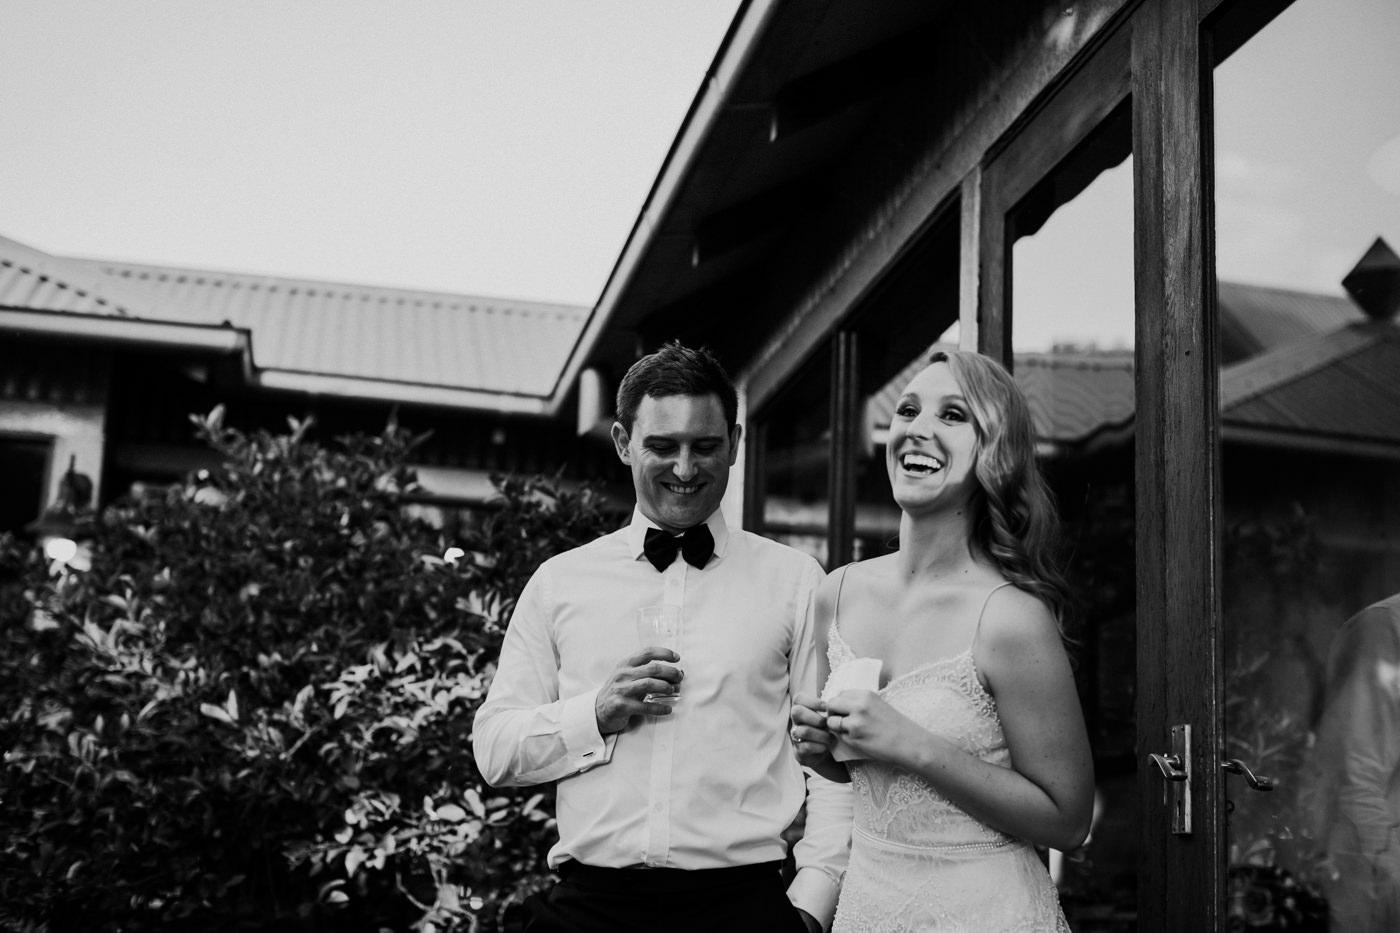 Anthony & Eliet - Wagga Wagga Wedding - Country NSW - Samantha Heather Photography-144.jpg